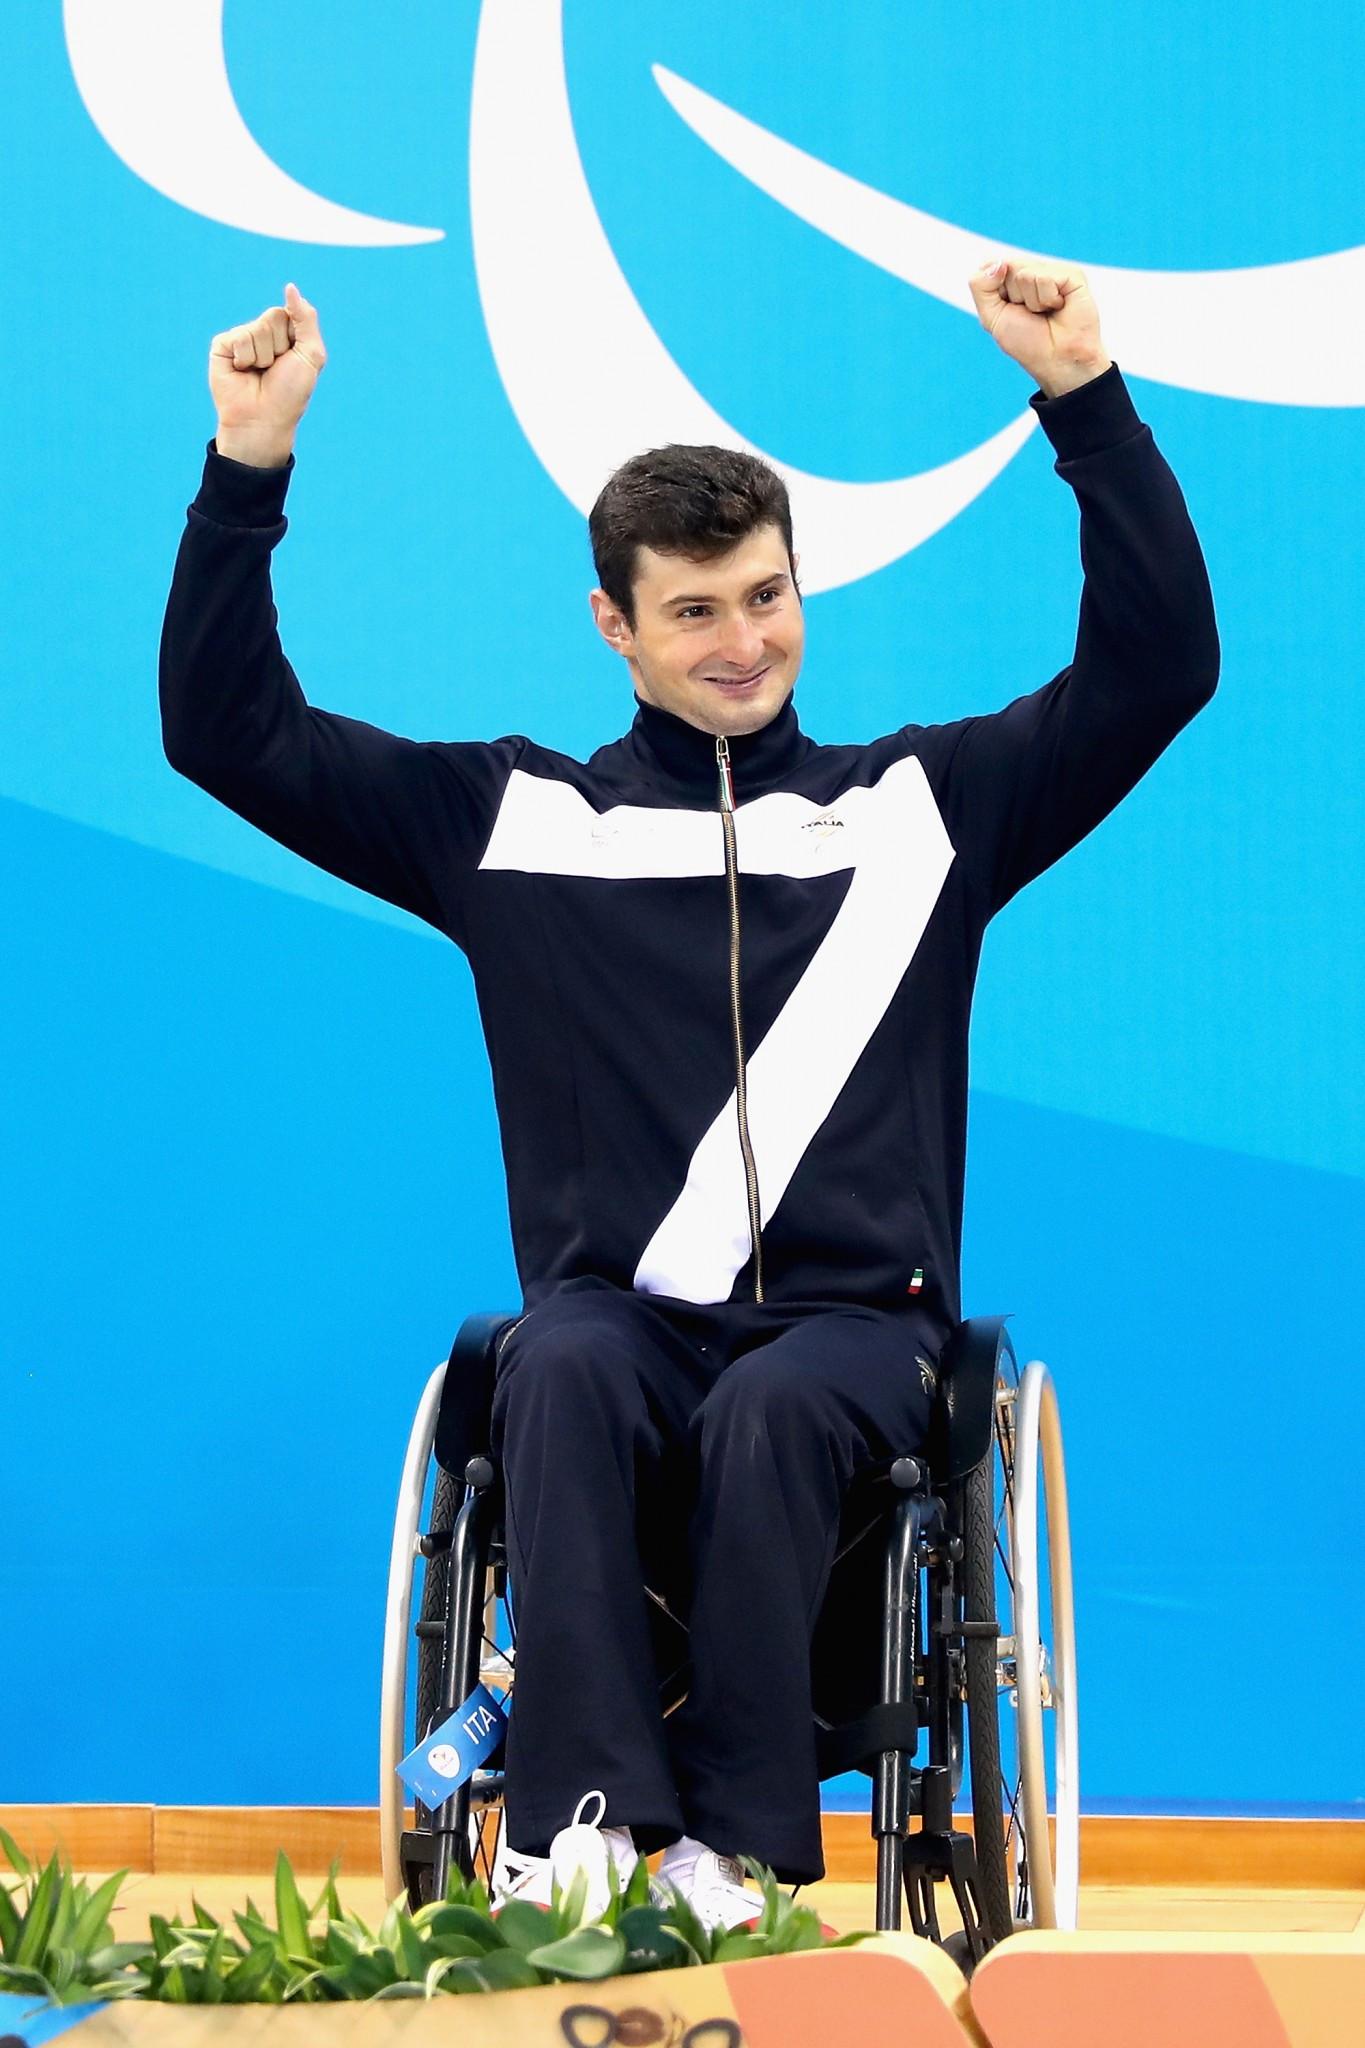 Francesco Bocciardo will also be looking to take his Rio 2016 form into Mexico City  ©Getty Images